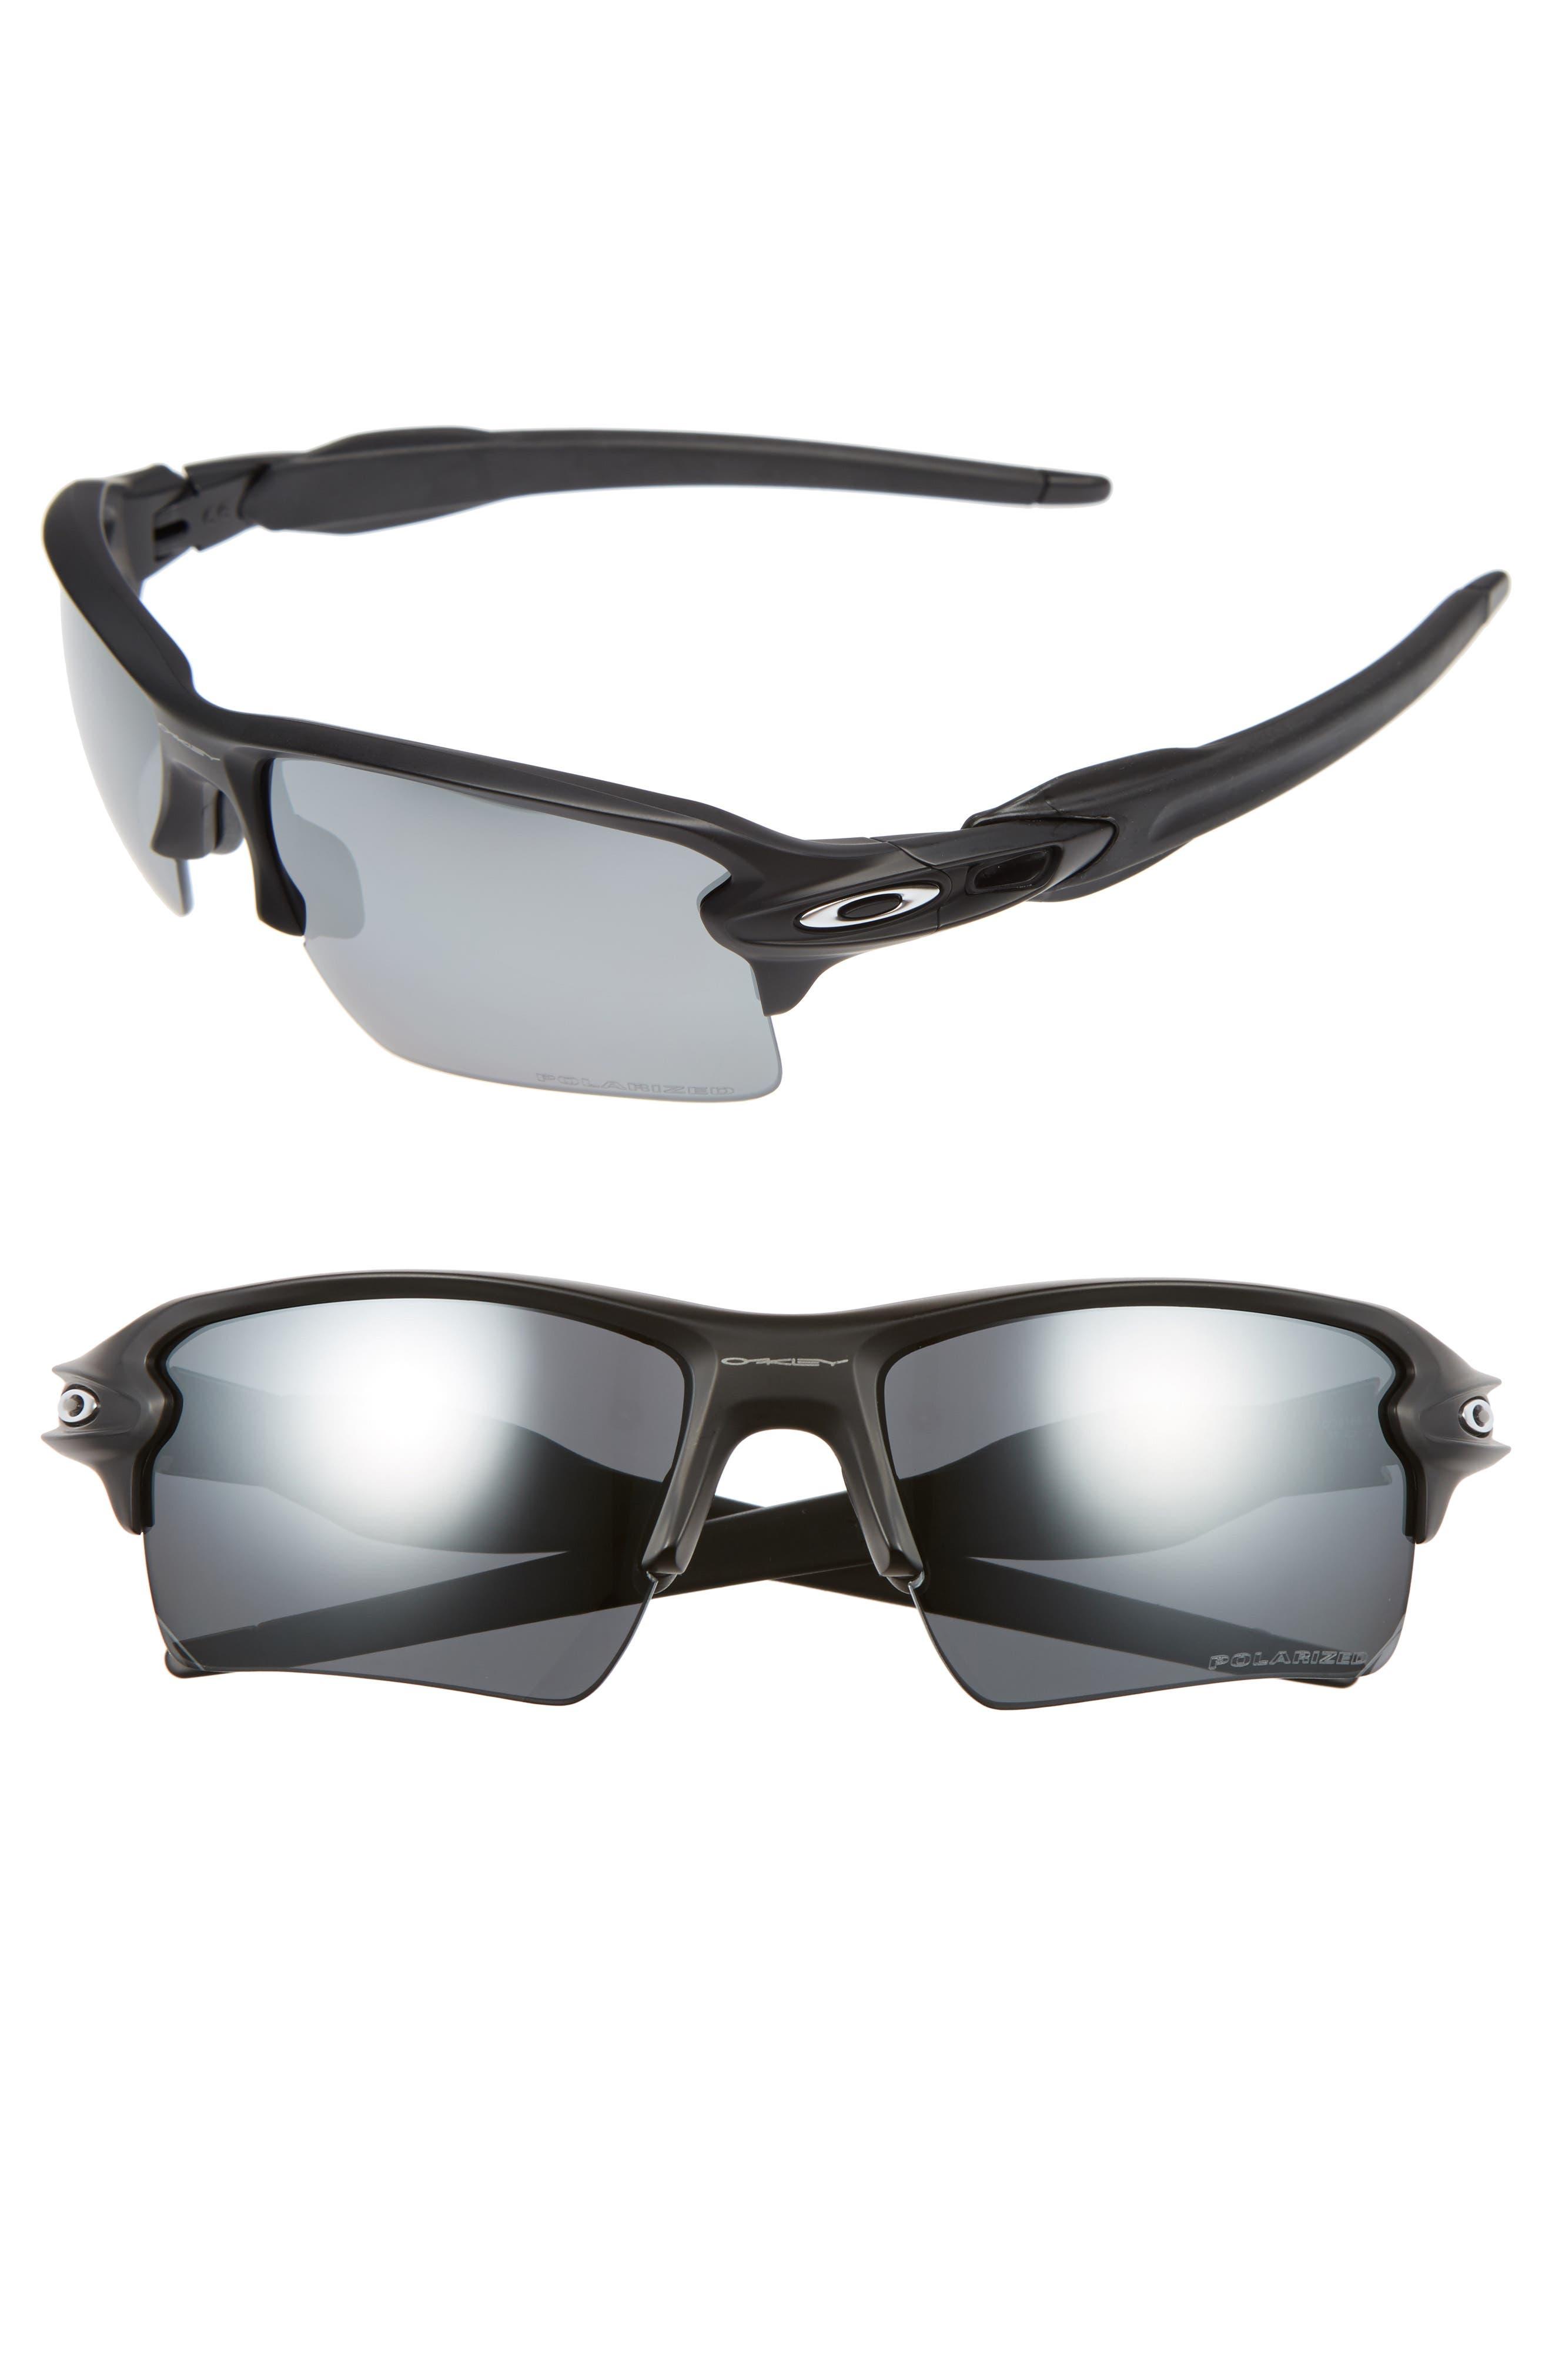 Flak 2.0 XL 59mm Polarized Sunglasses,                         Main,                         color, 001